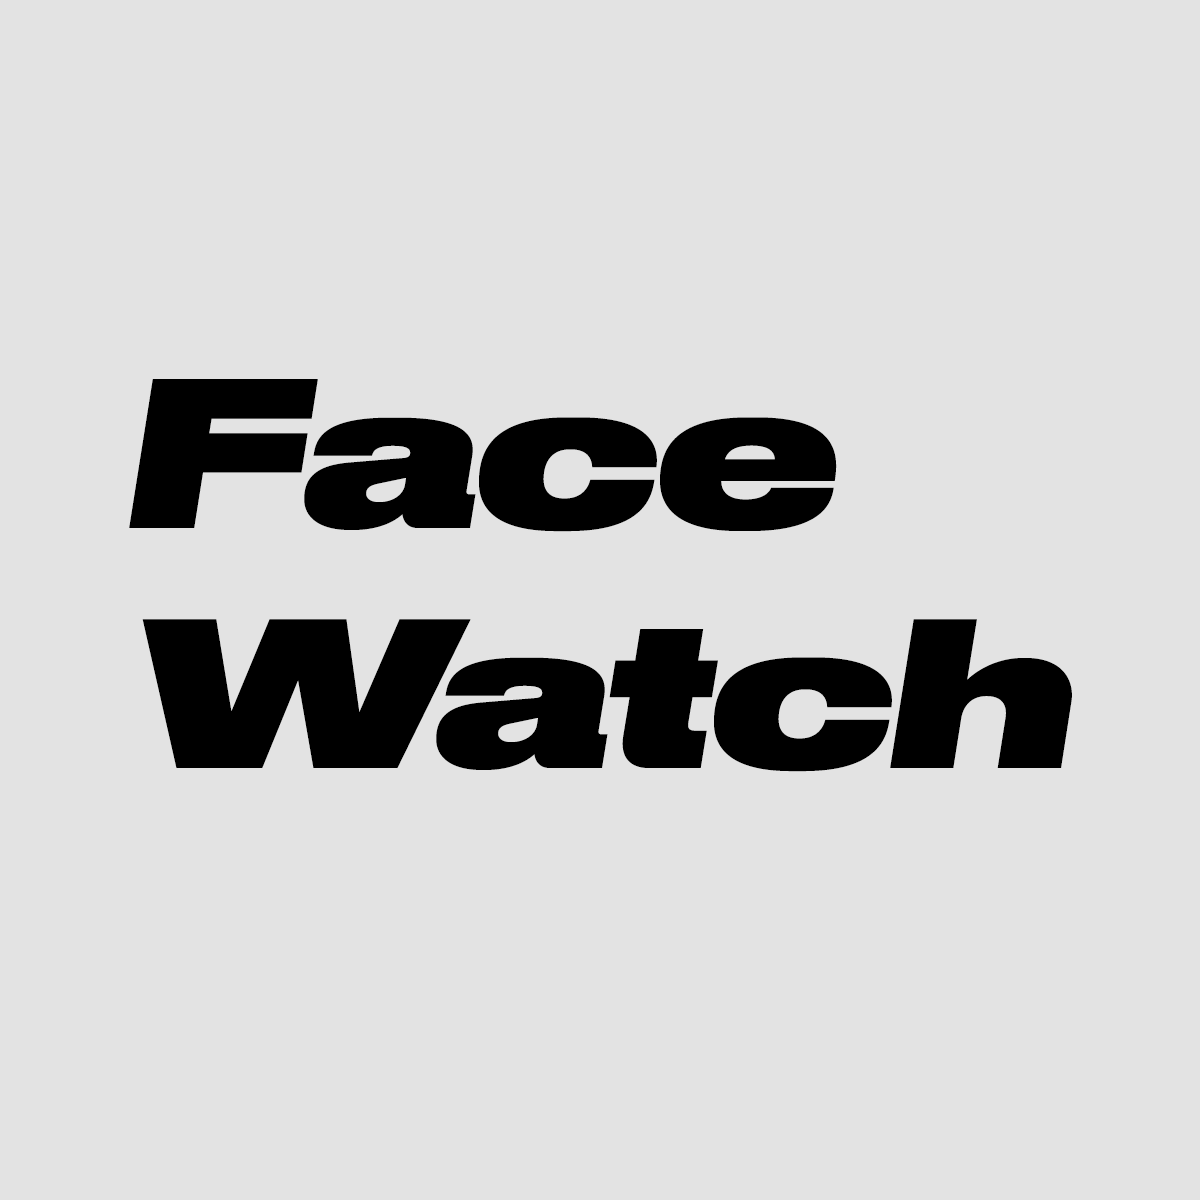 Logo of Facewatch